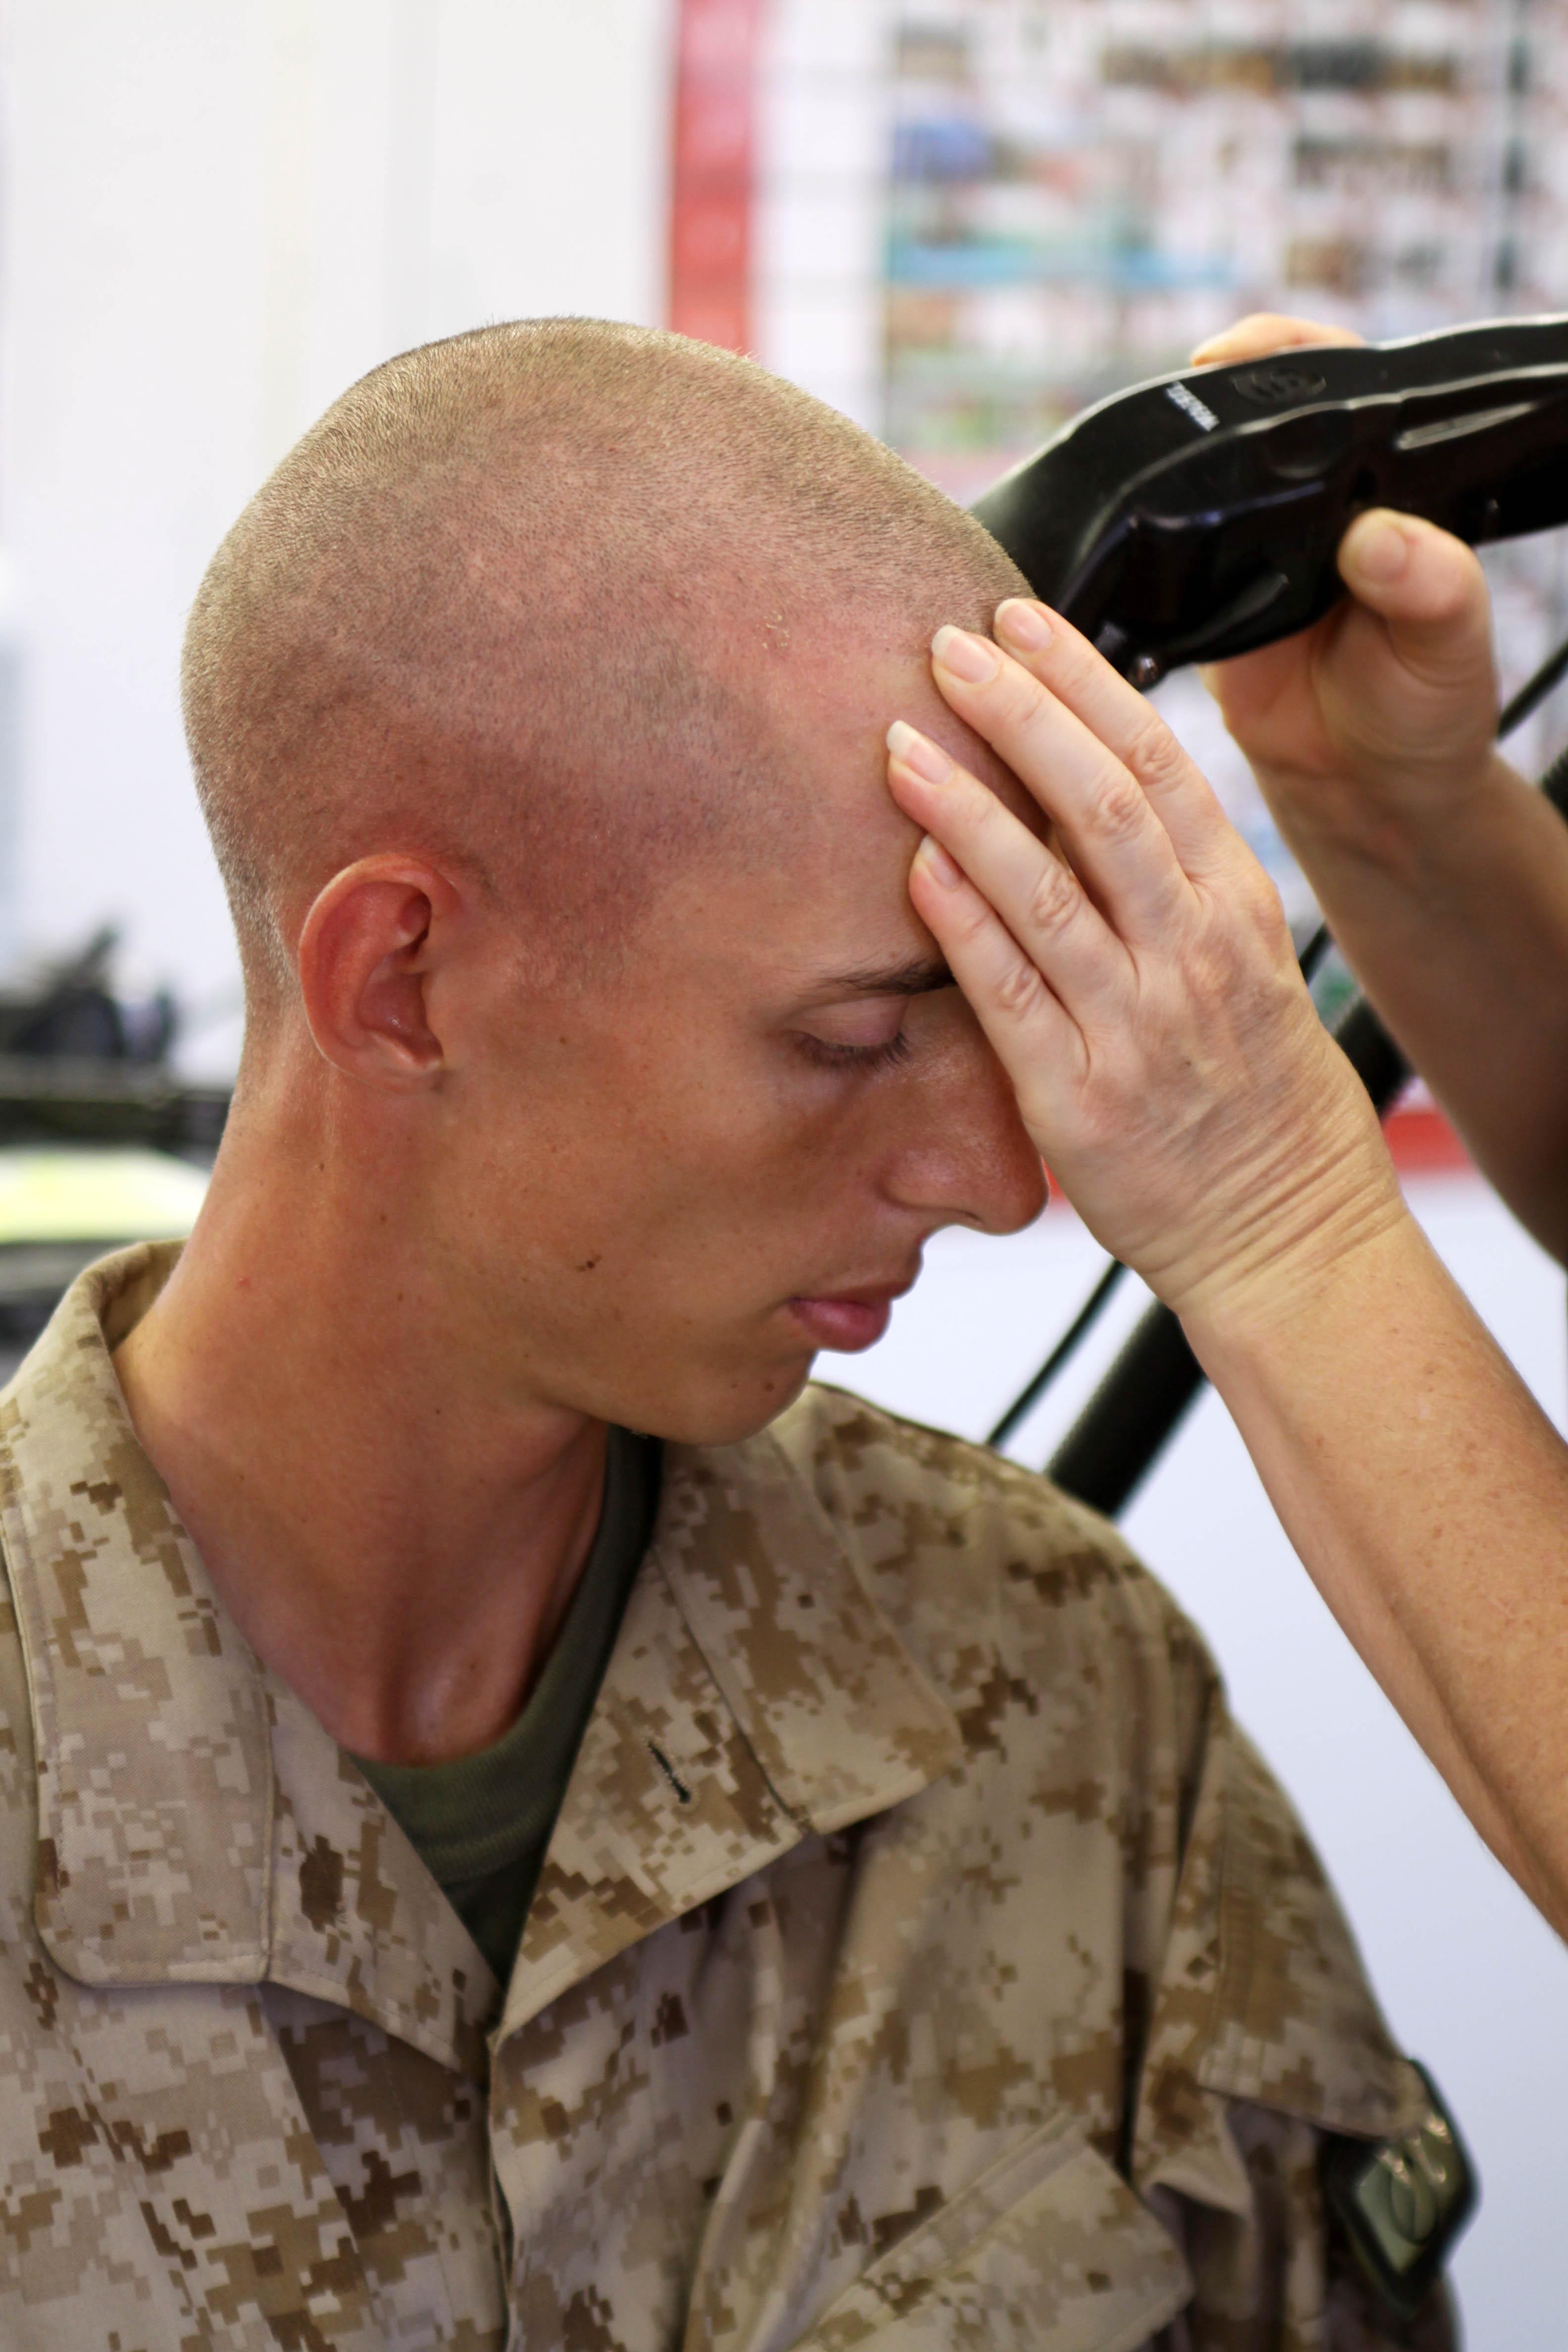 Marine Corps Haircut High And Tight Marine haircut download hi re.